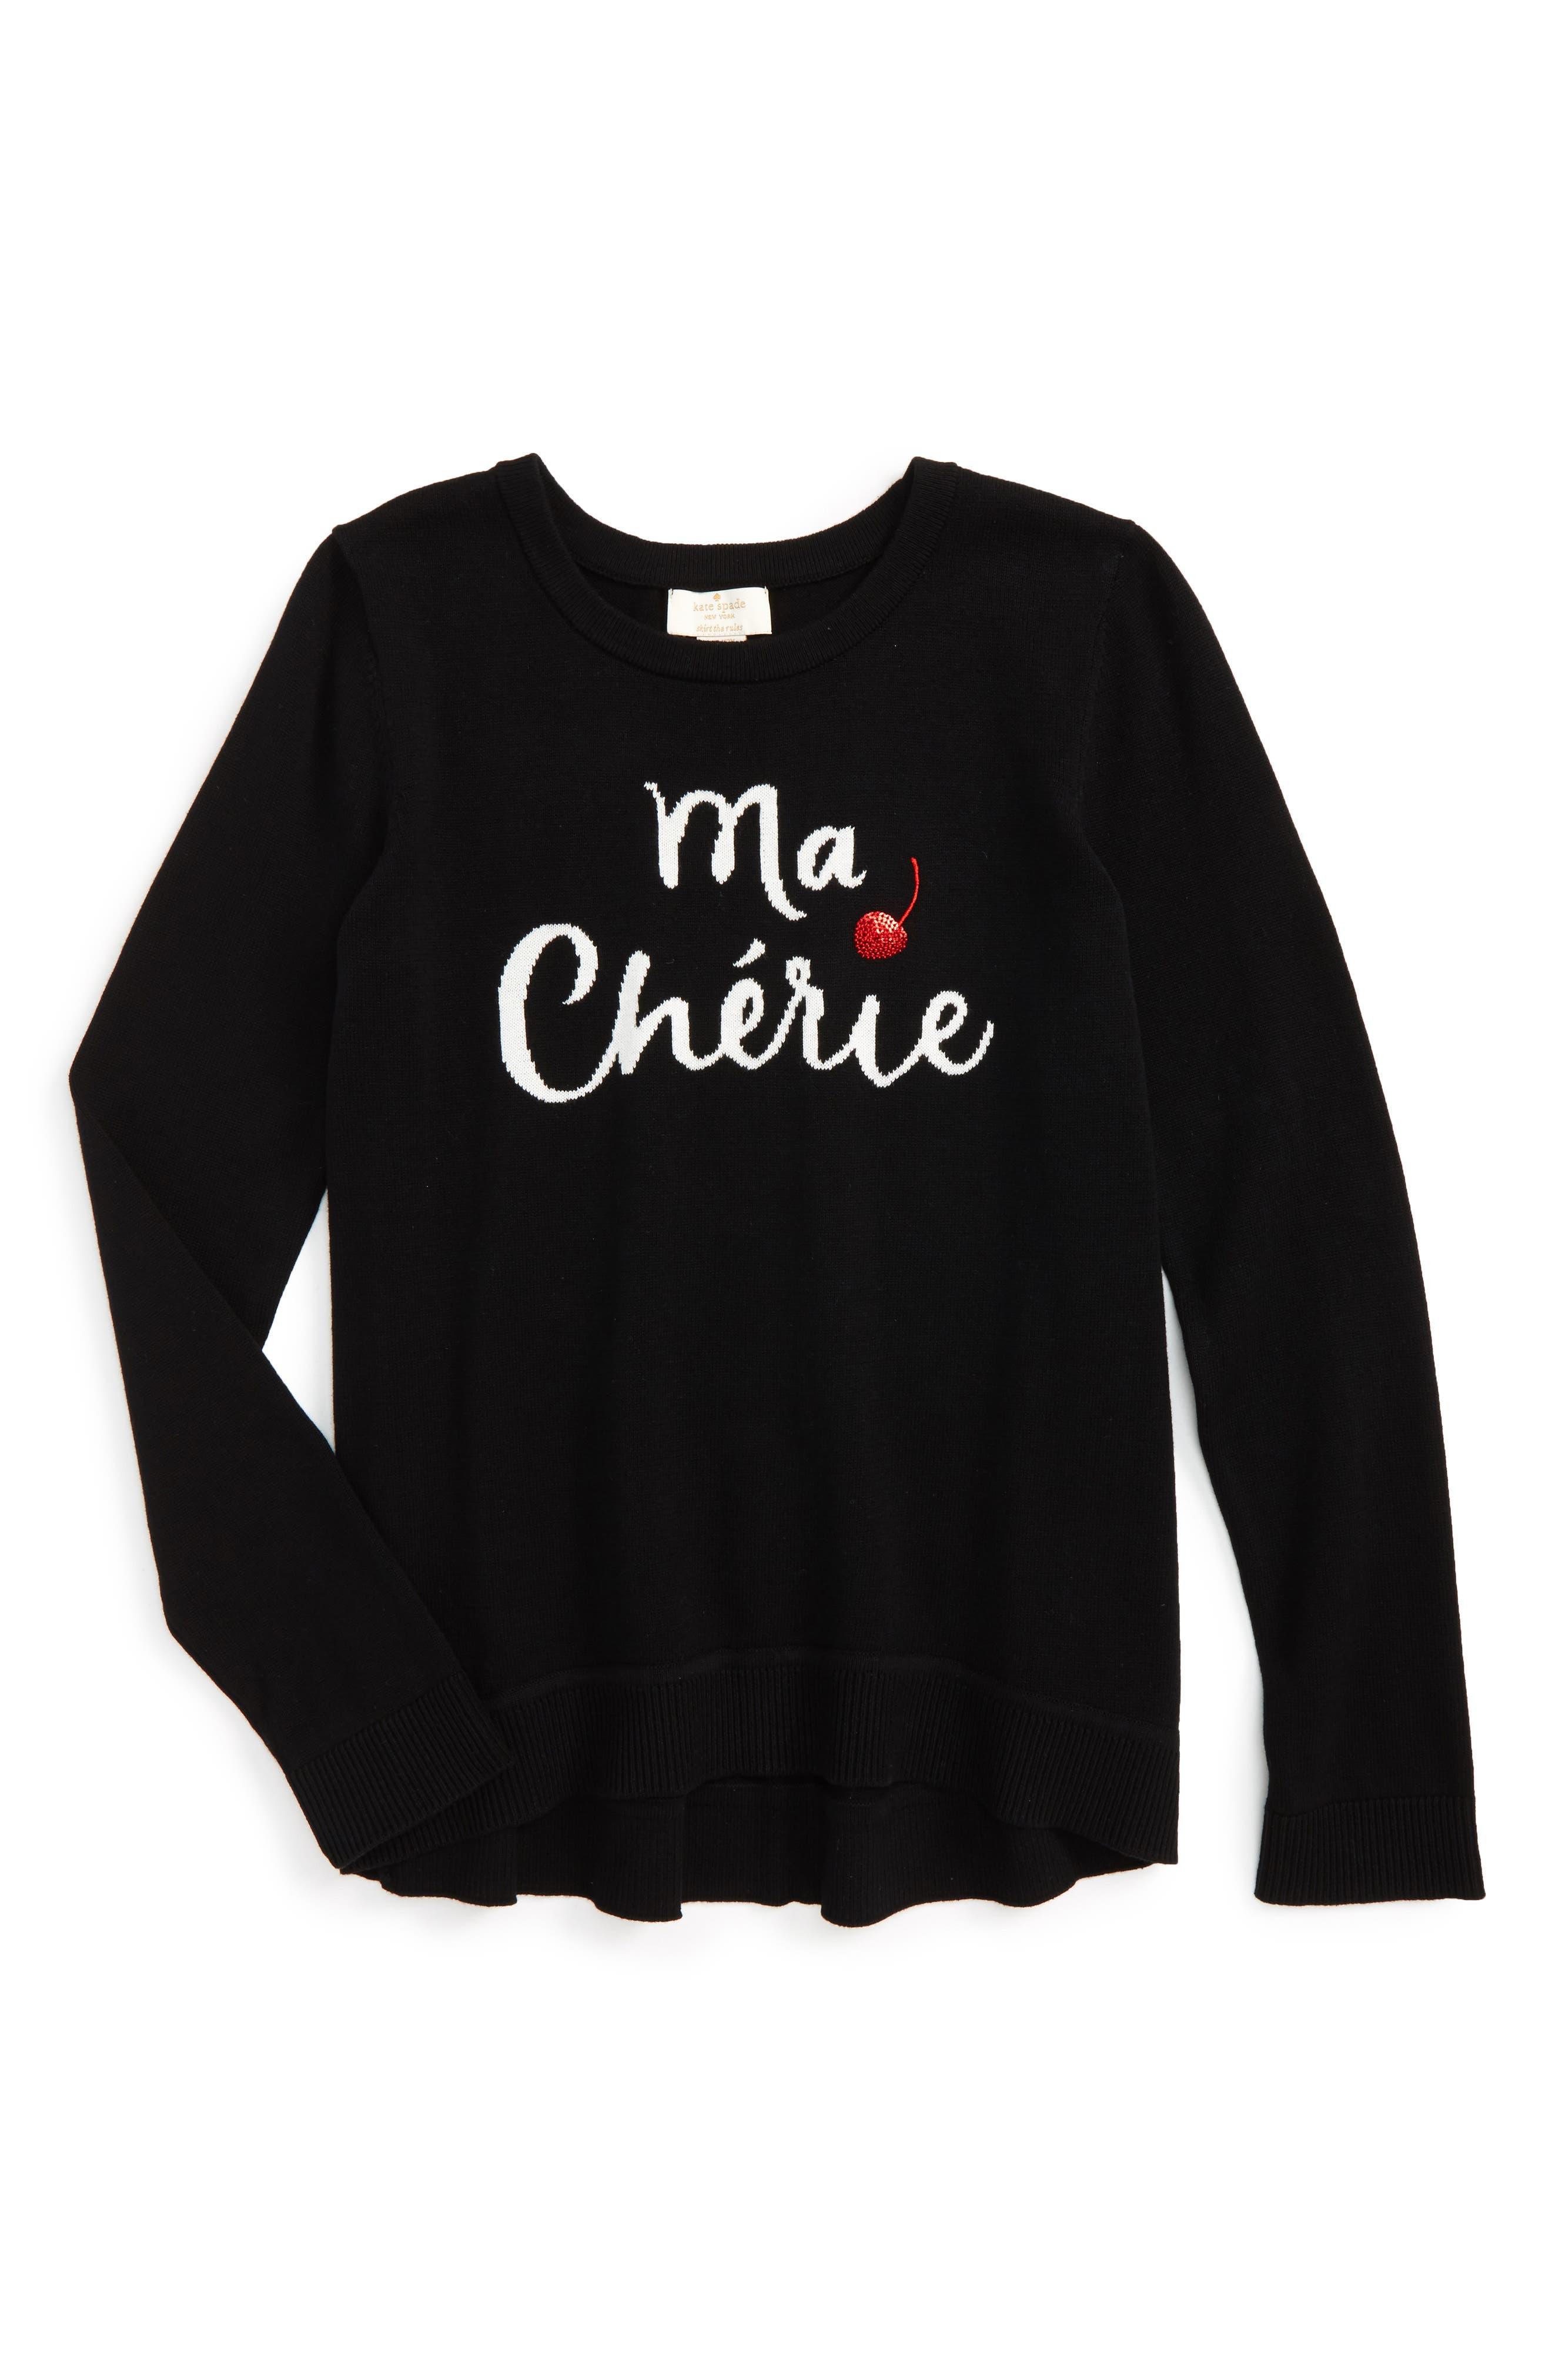 Alternate Image 1 Selected - kate spade new york ma cherie intasrsia sweater (Big Girls)